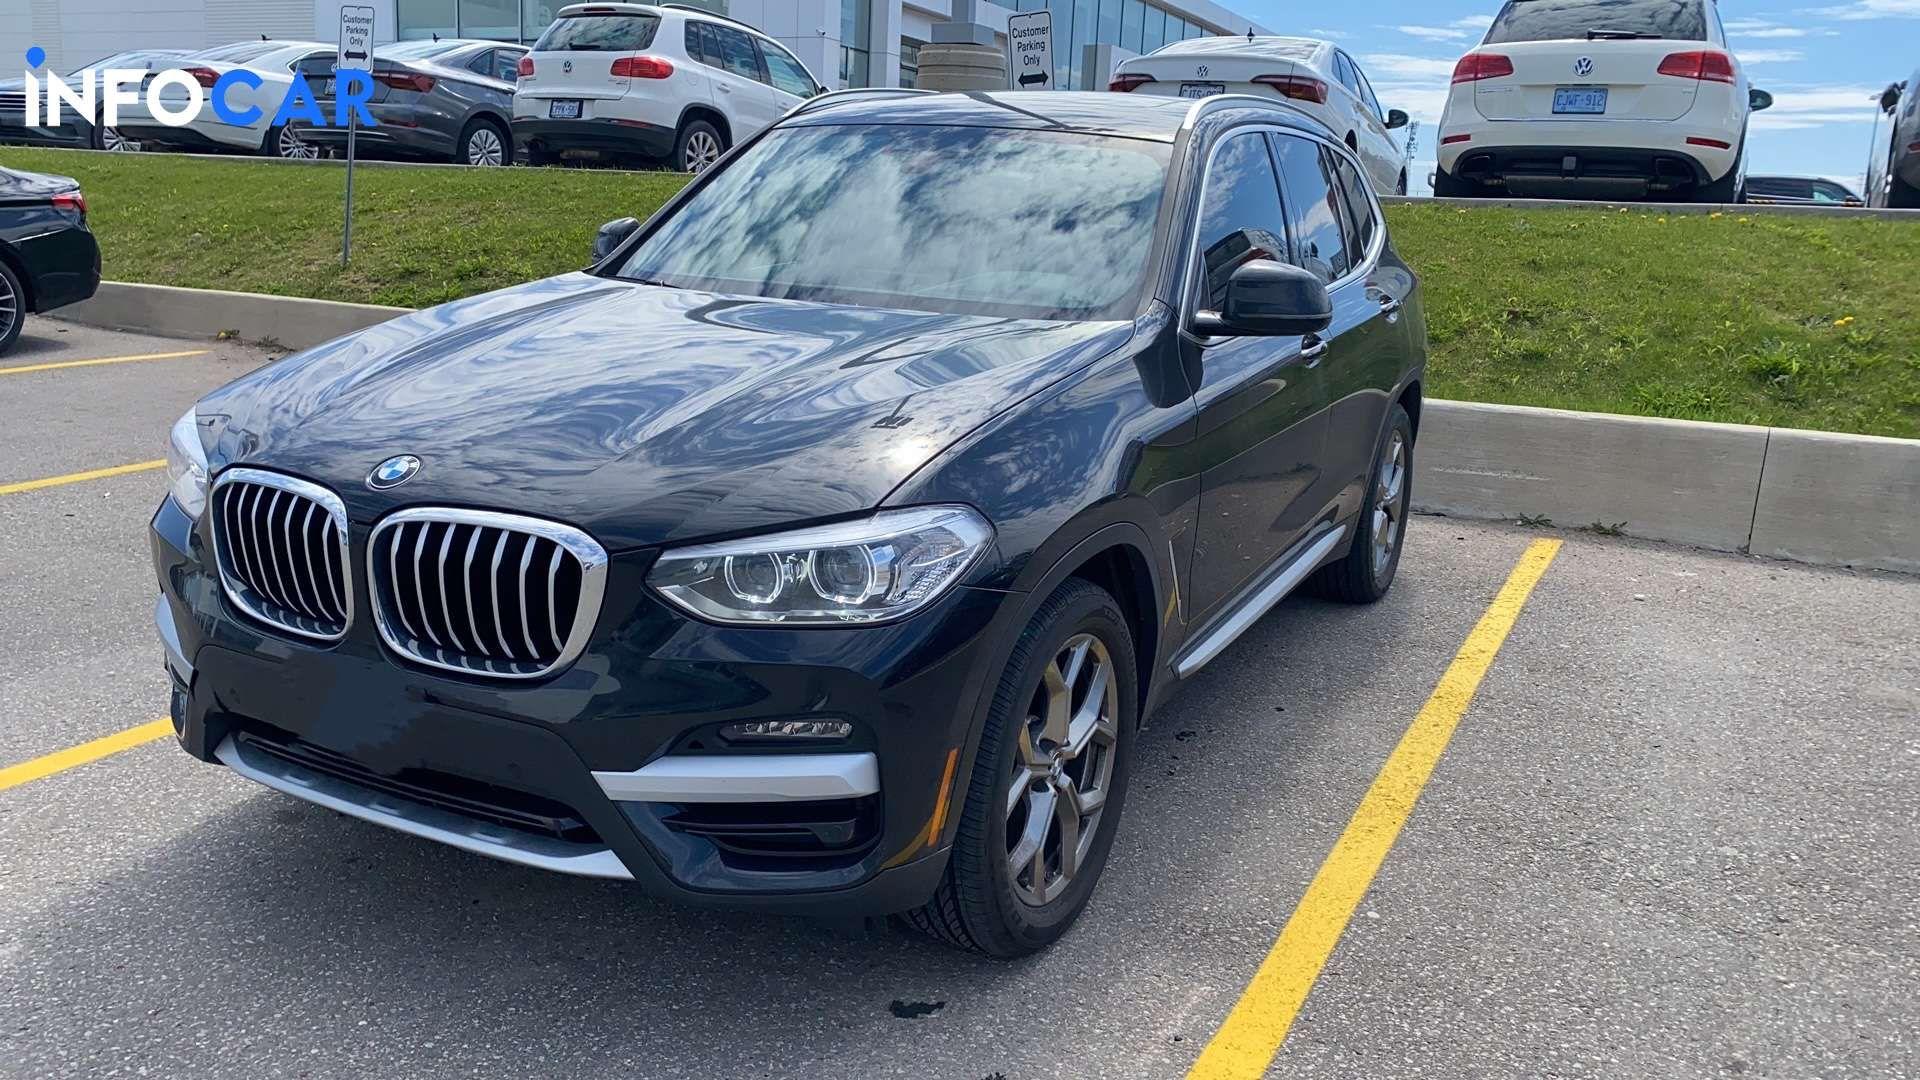 2021 BMW X3 30i - INFOCAR - Toronto's Most Comprehensive New and Used Auto Trading Platform